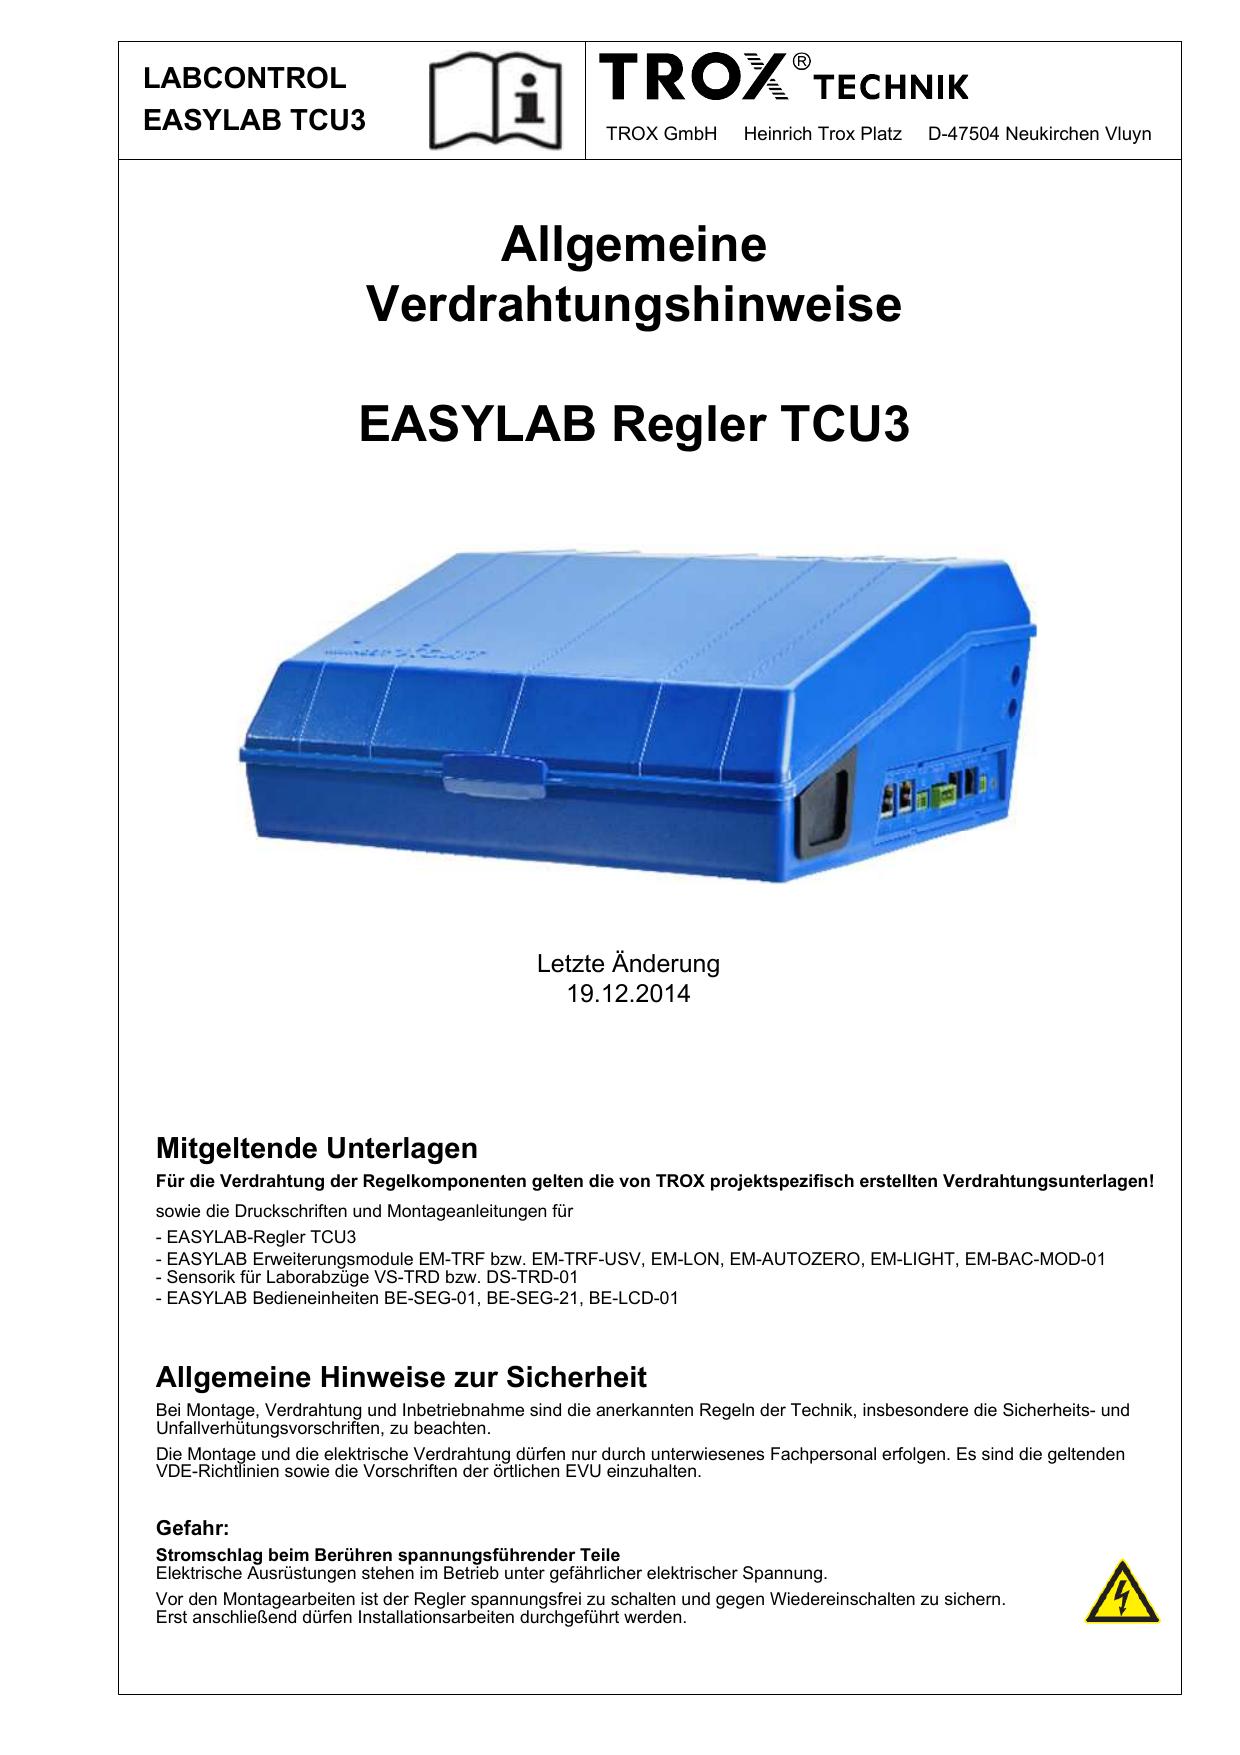 Allgemeine Verdrahtungshinweise EASYLAB TCU3 | manualzz.com